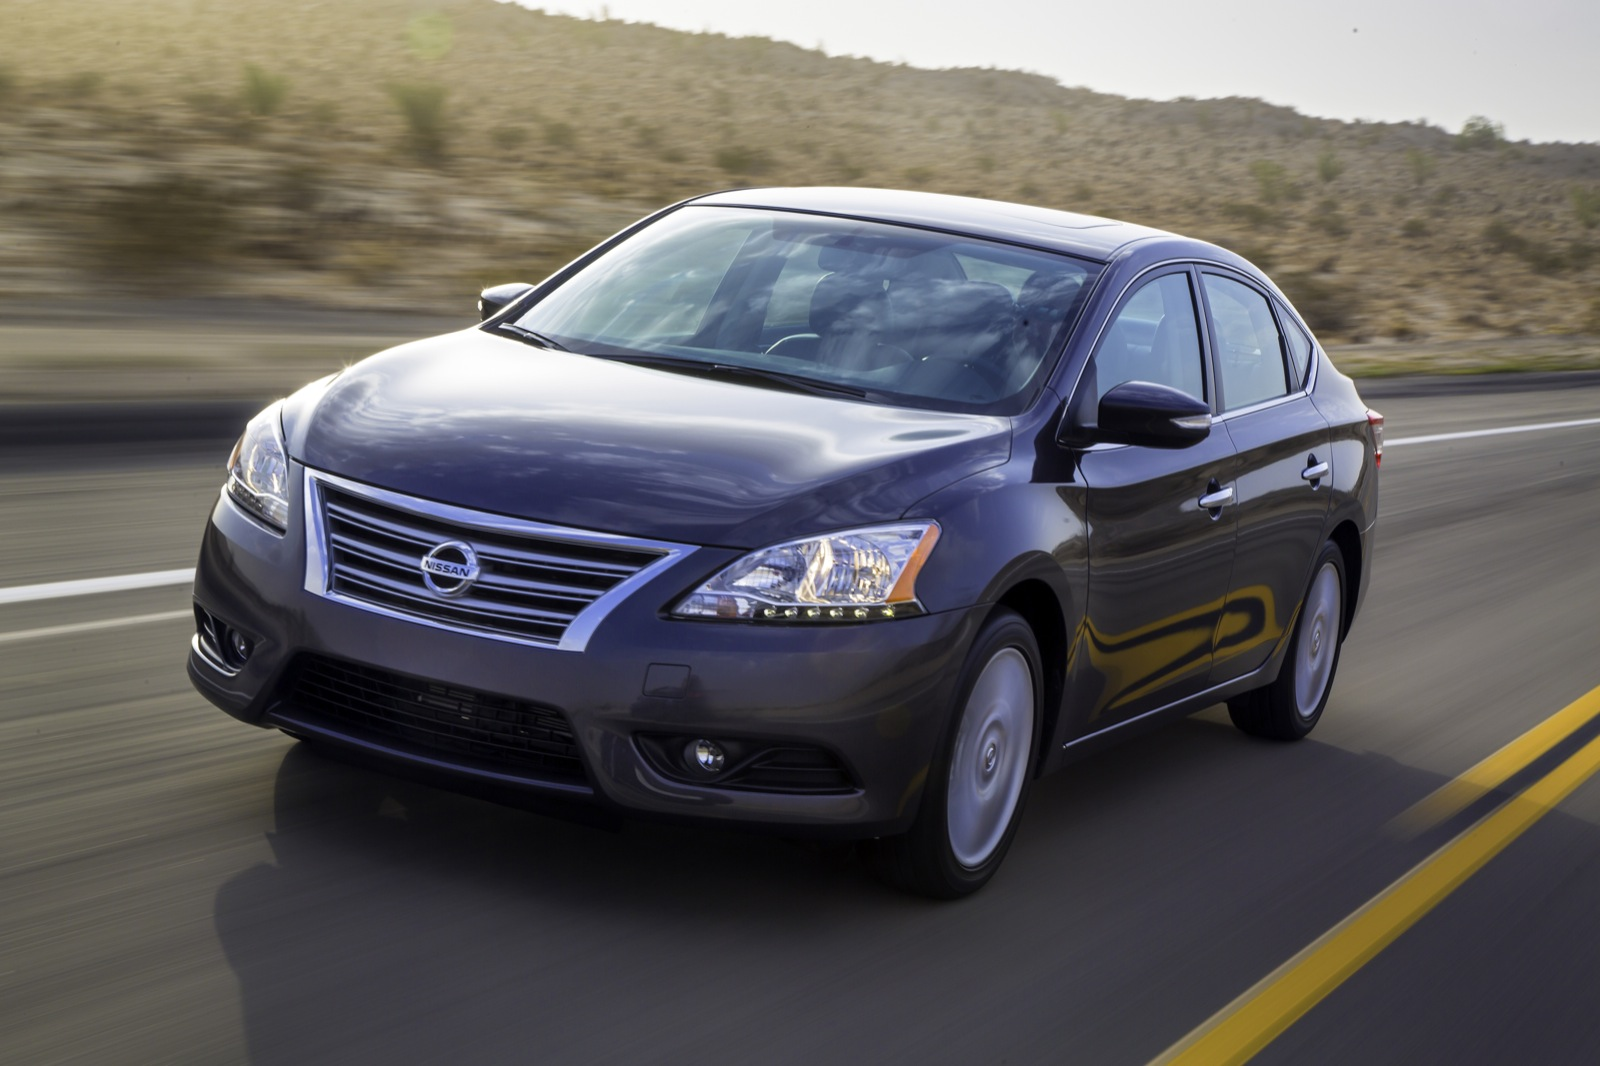 2013-14 Nissan Sentra & Versa Investigated For Brake Problems